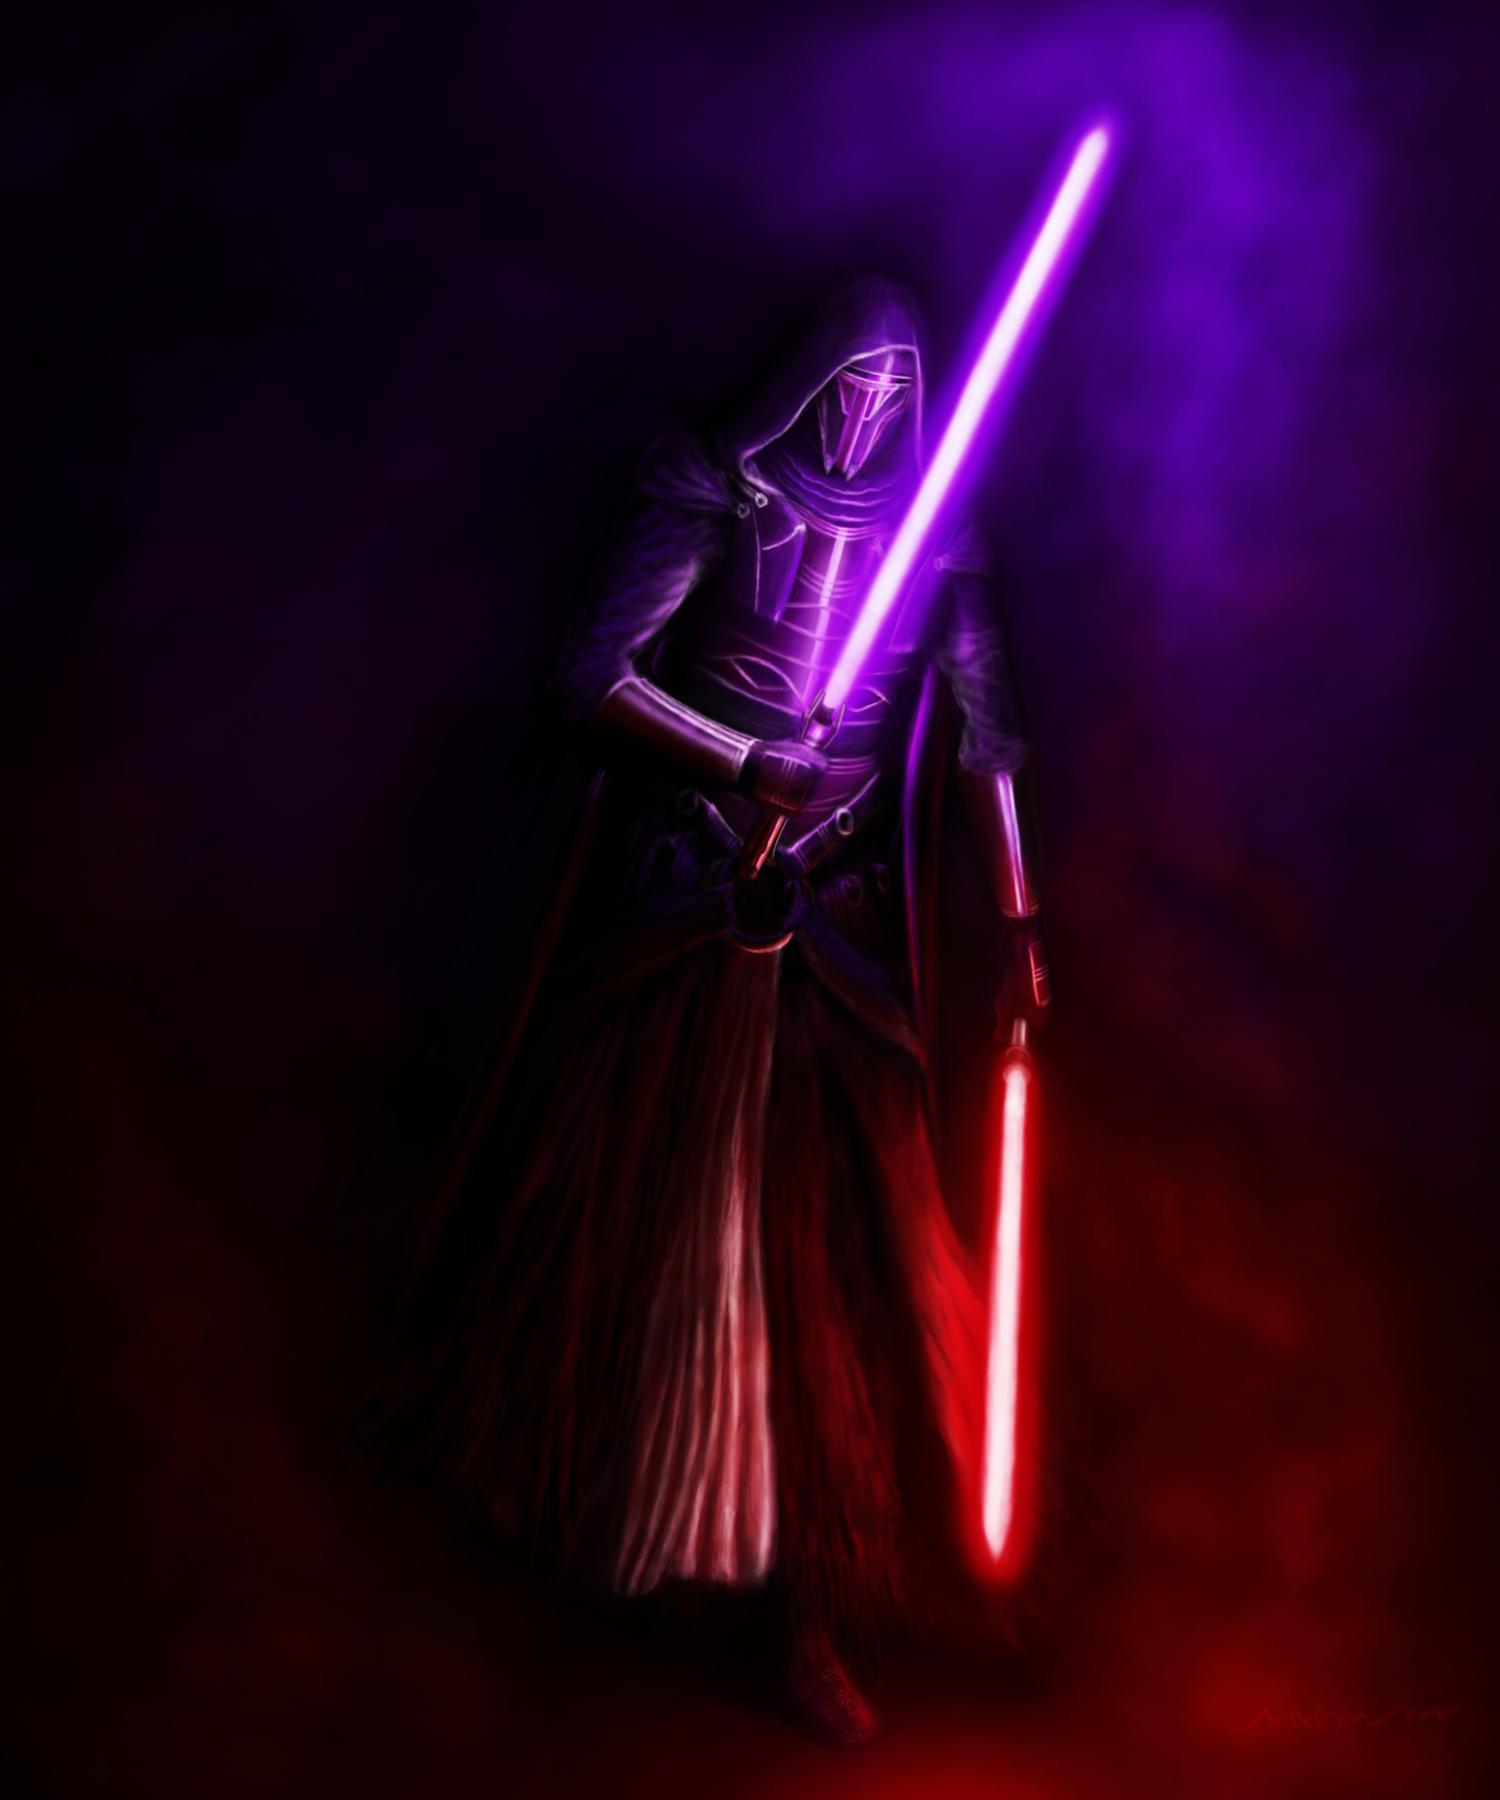 Darth Revan In 2020 Star Wars Darth Revan Star Wars Art Star Wars Wallpaper